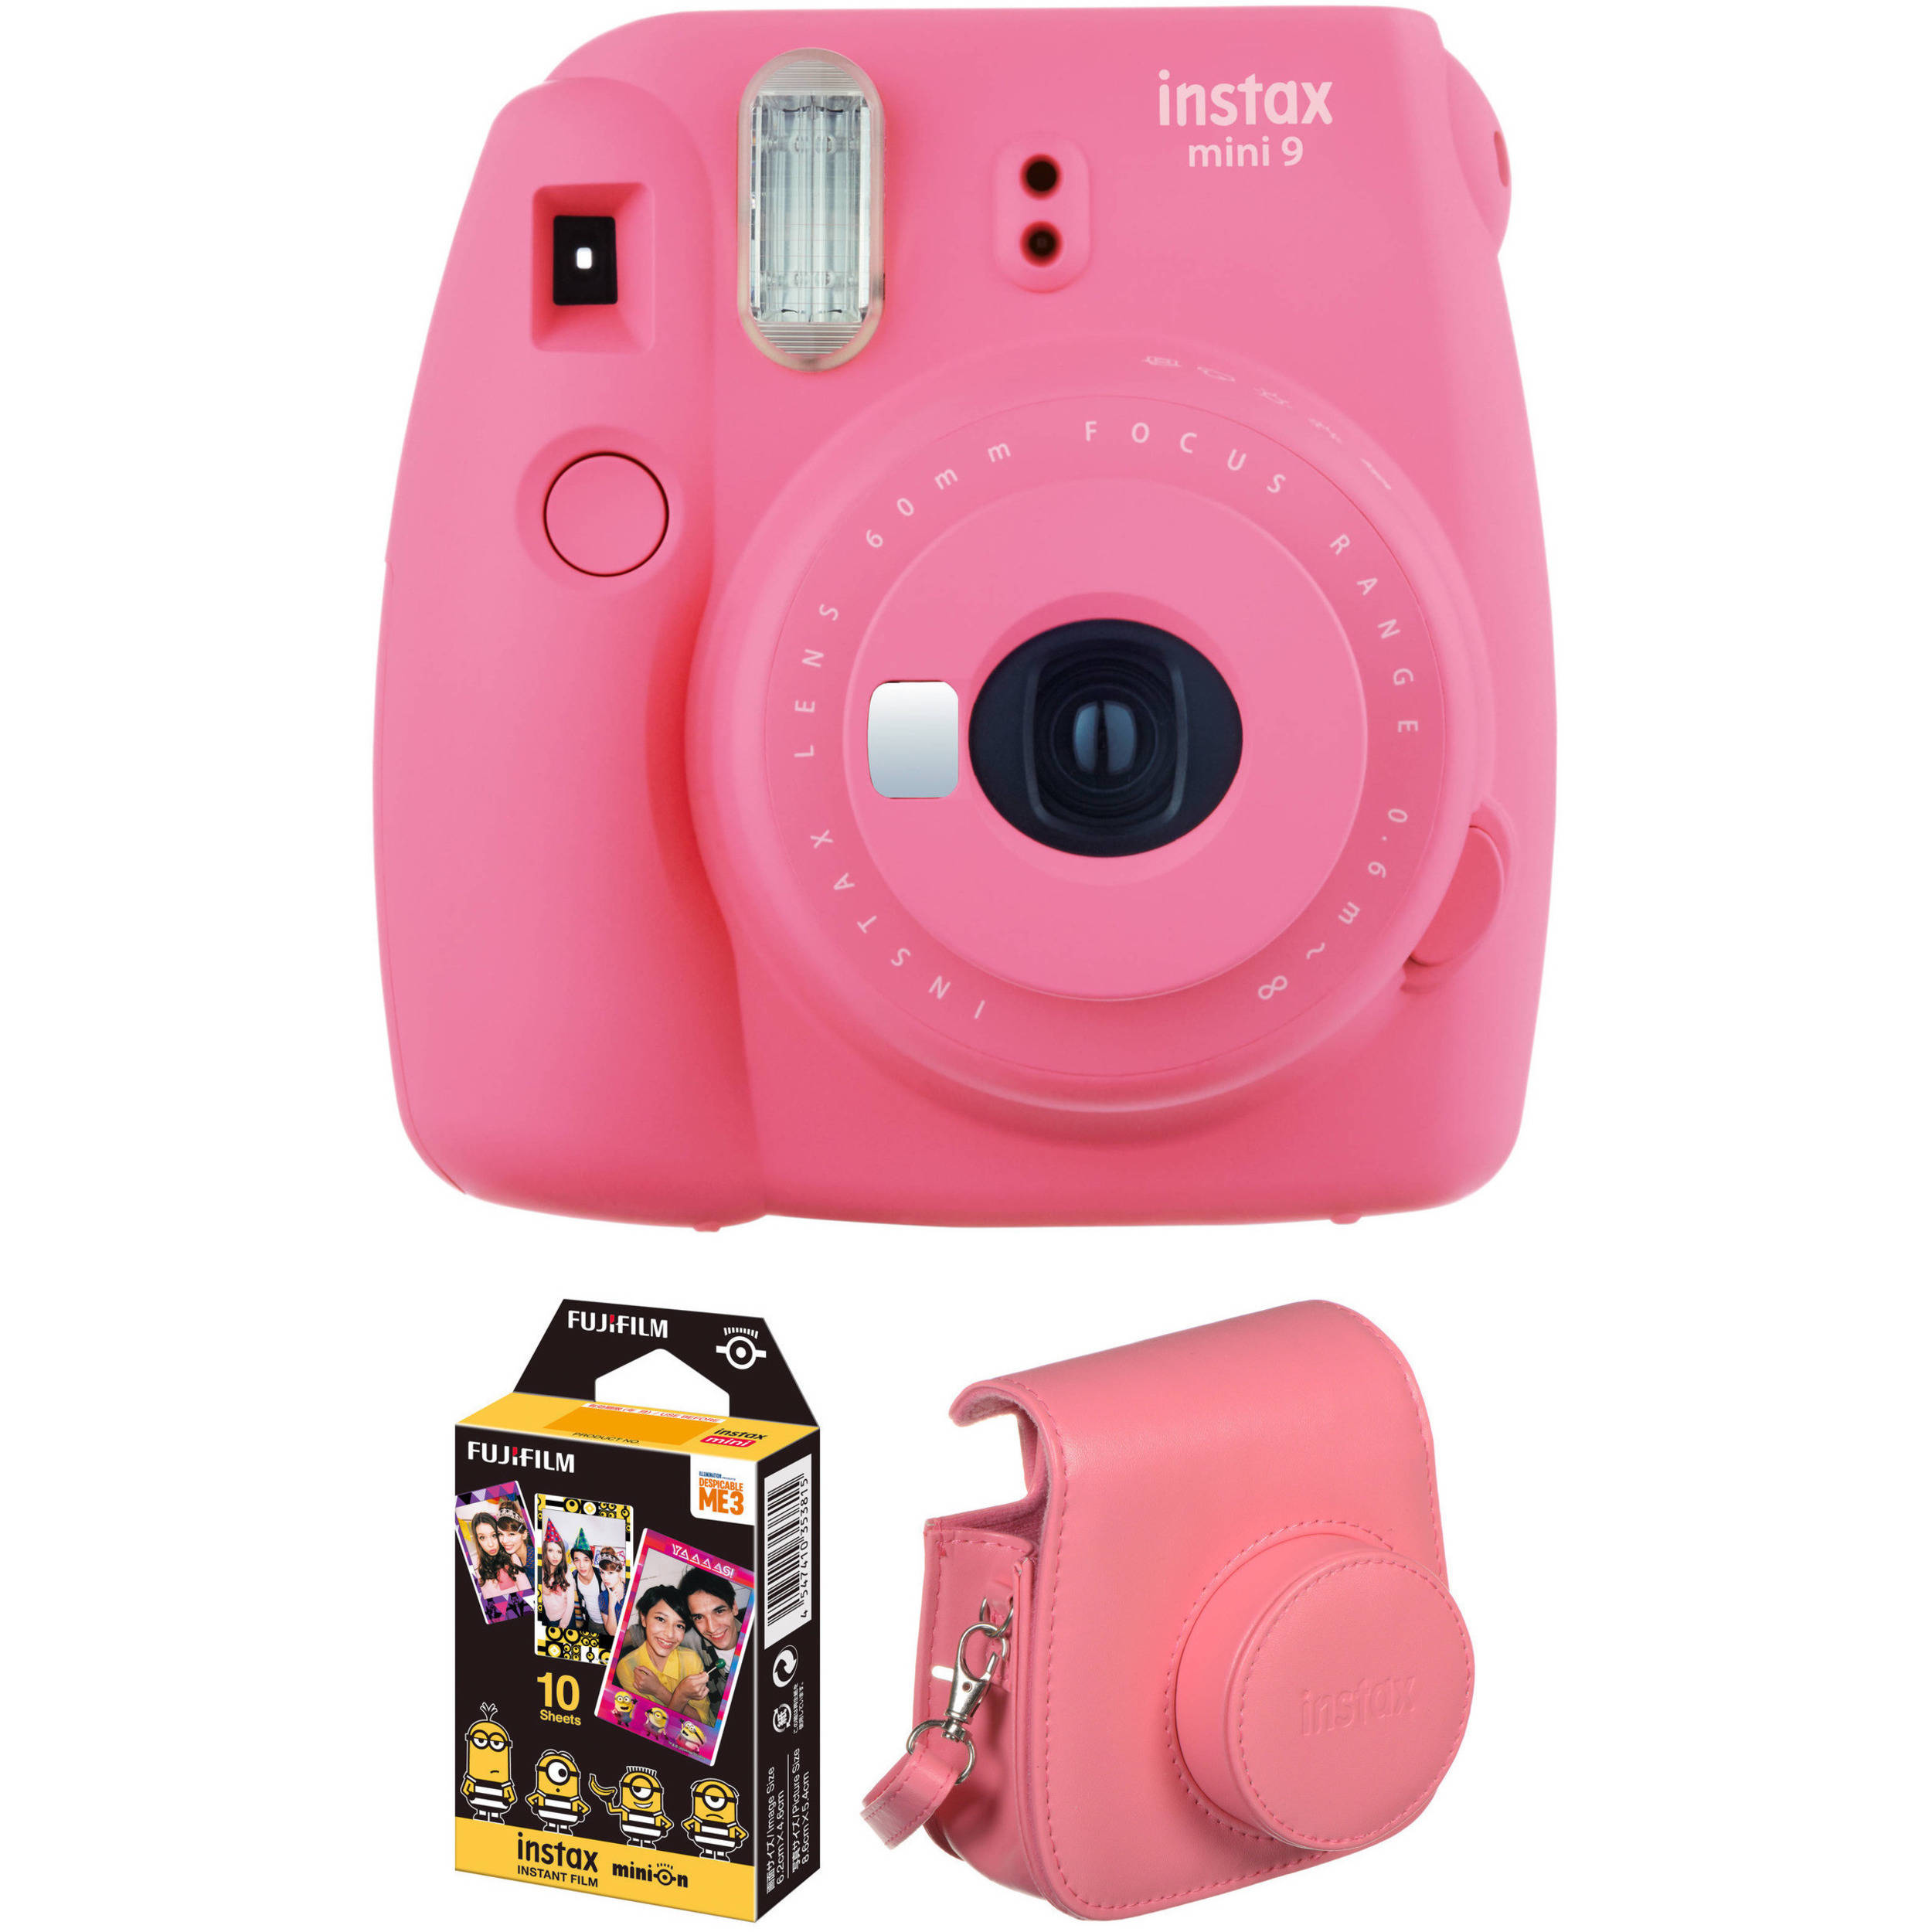 Fujifilm instax mini 9 instant film camera with instant for Housse instax mini 9